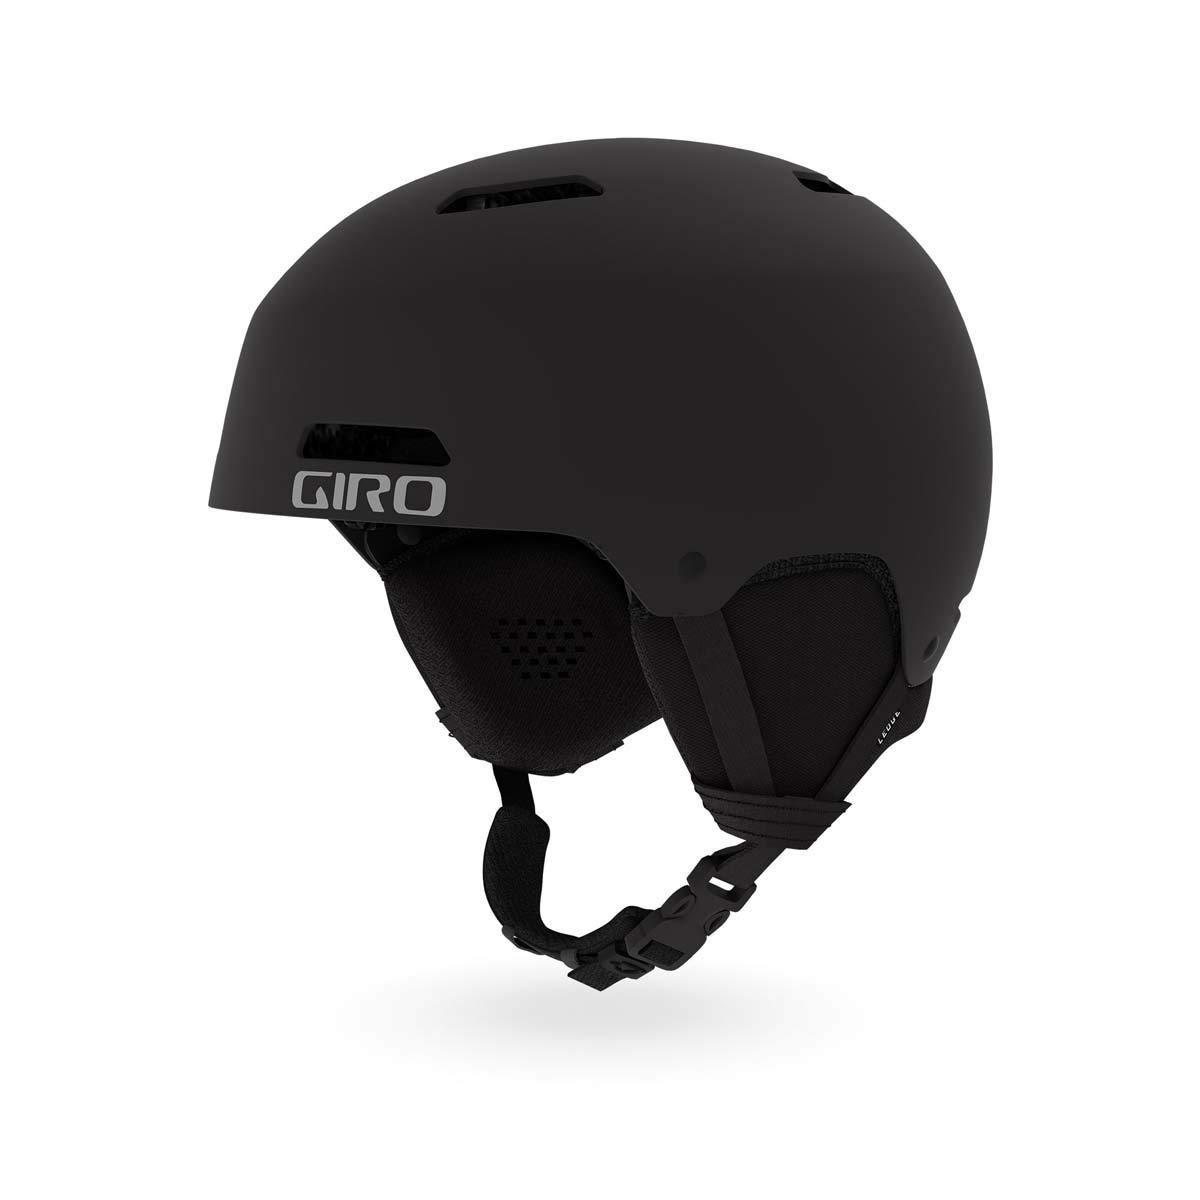 Giro Ledge Cheap Men's Ski Helmets